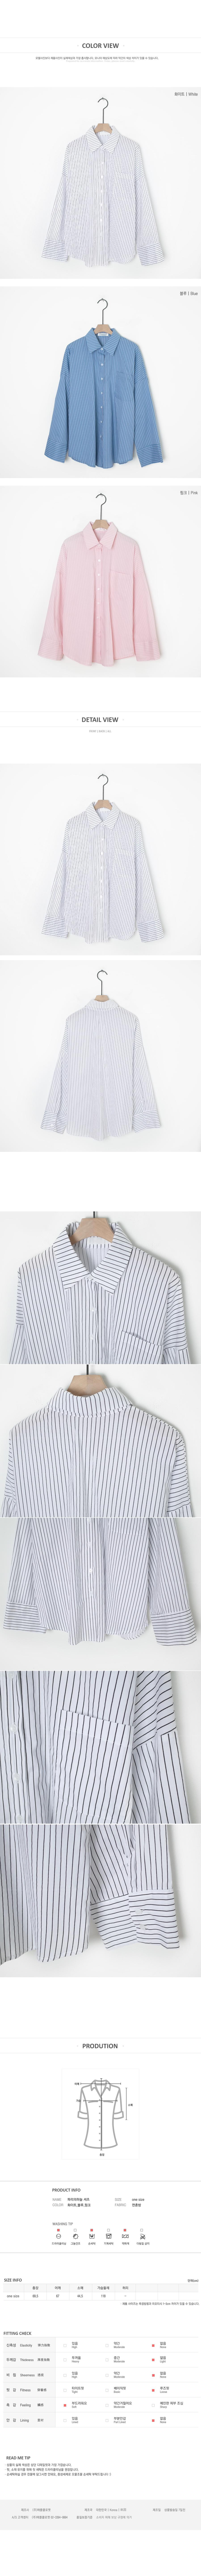 Paris sky shirt